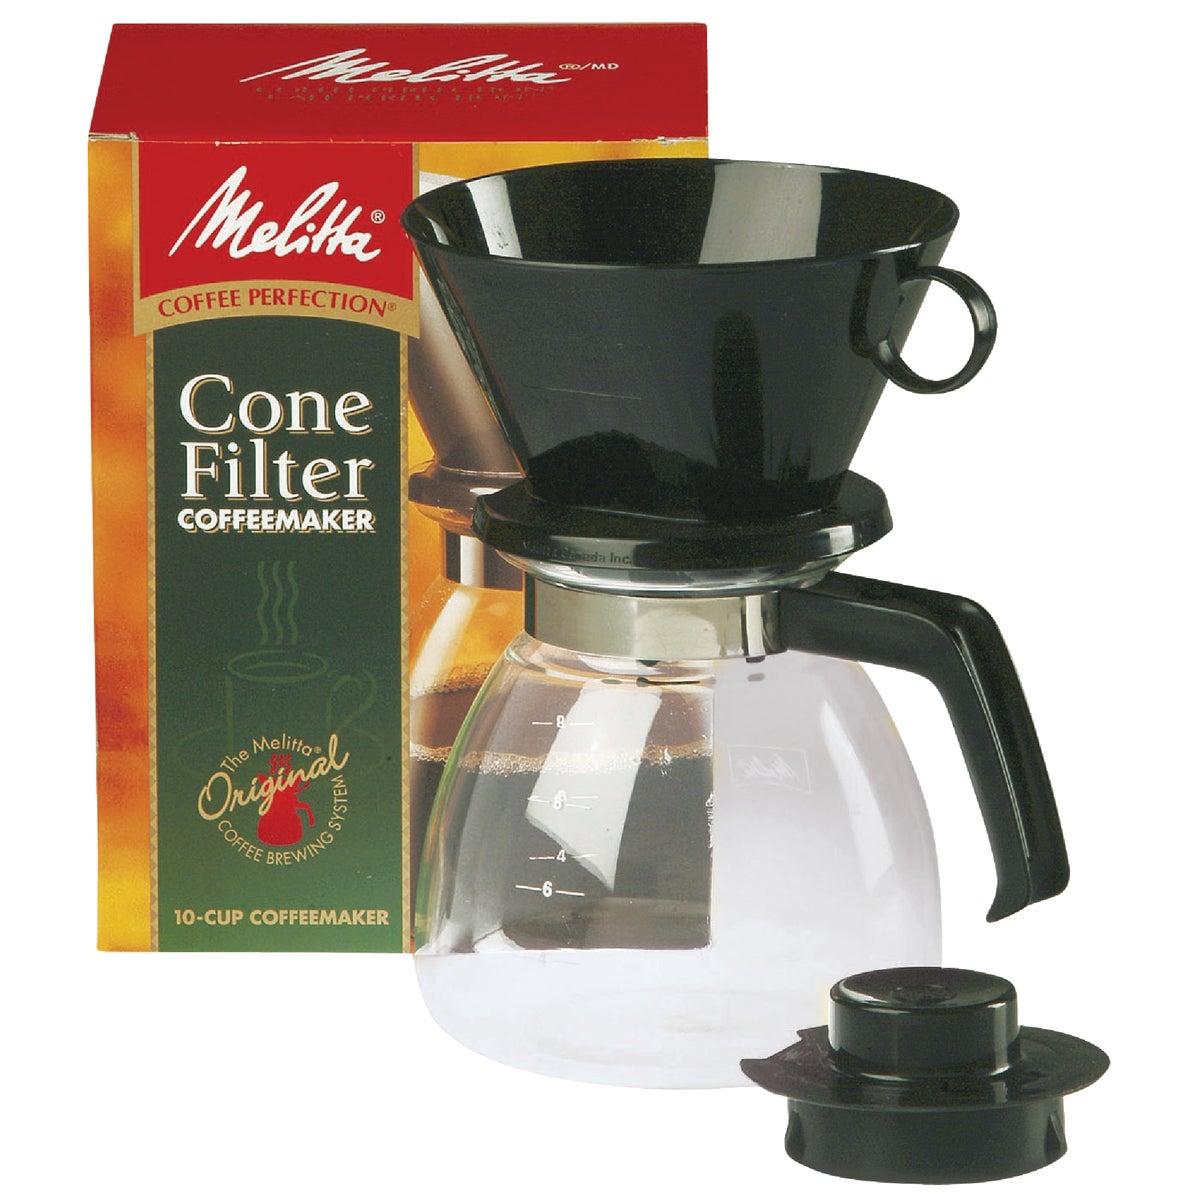 Melitta Gourmet 10 Cup Manual Coffeemaker-DRIP CONE COFFEE MAKER 55437640619 eBay